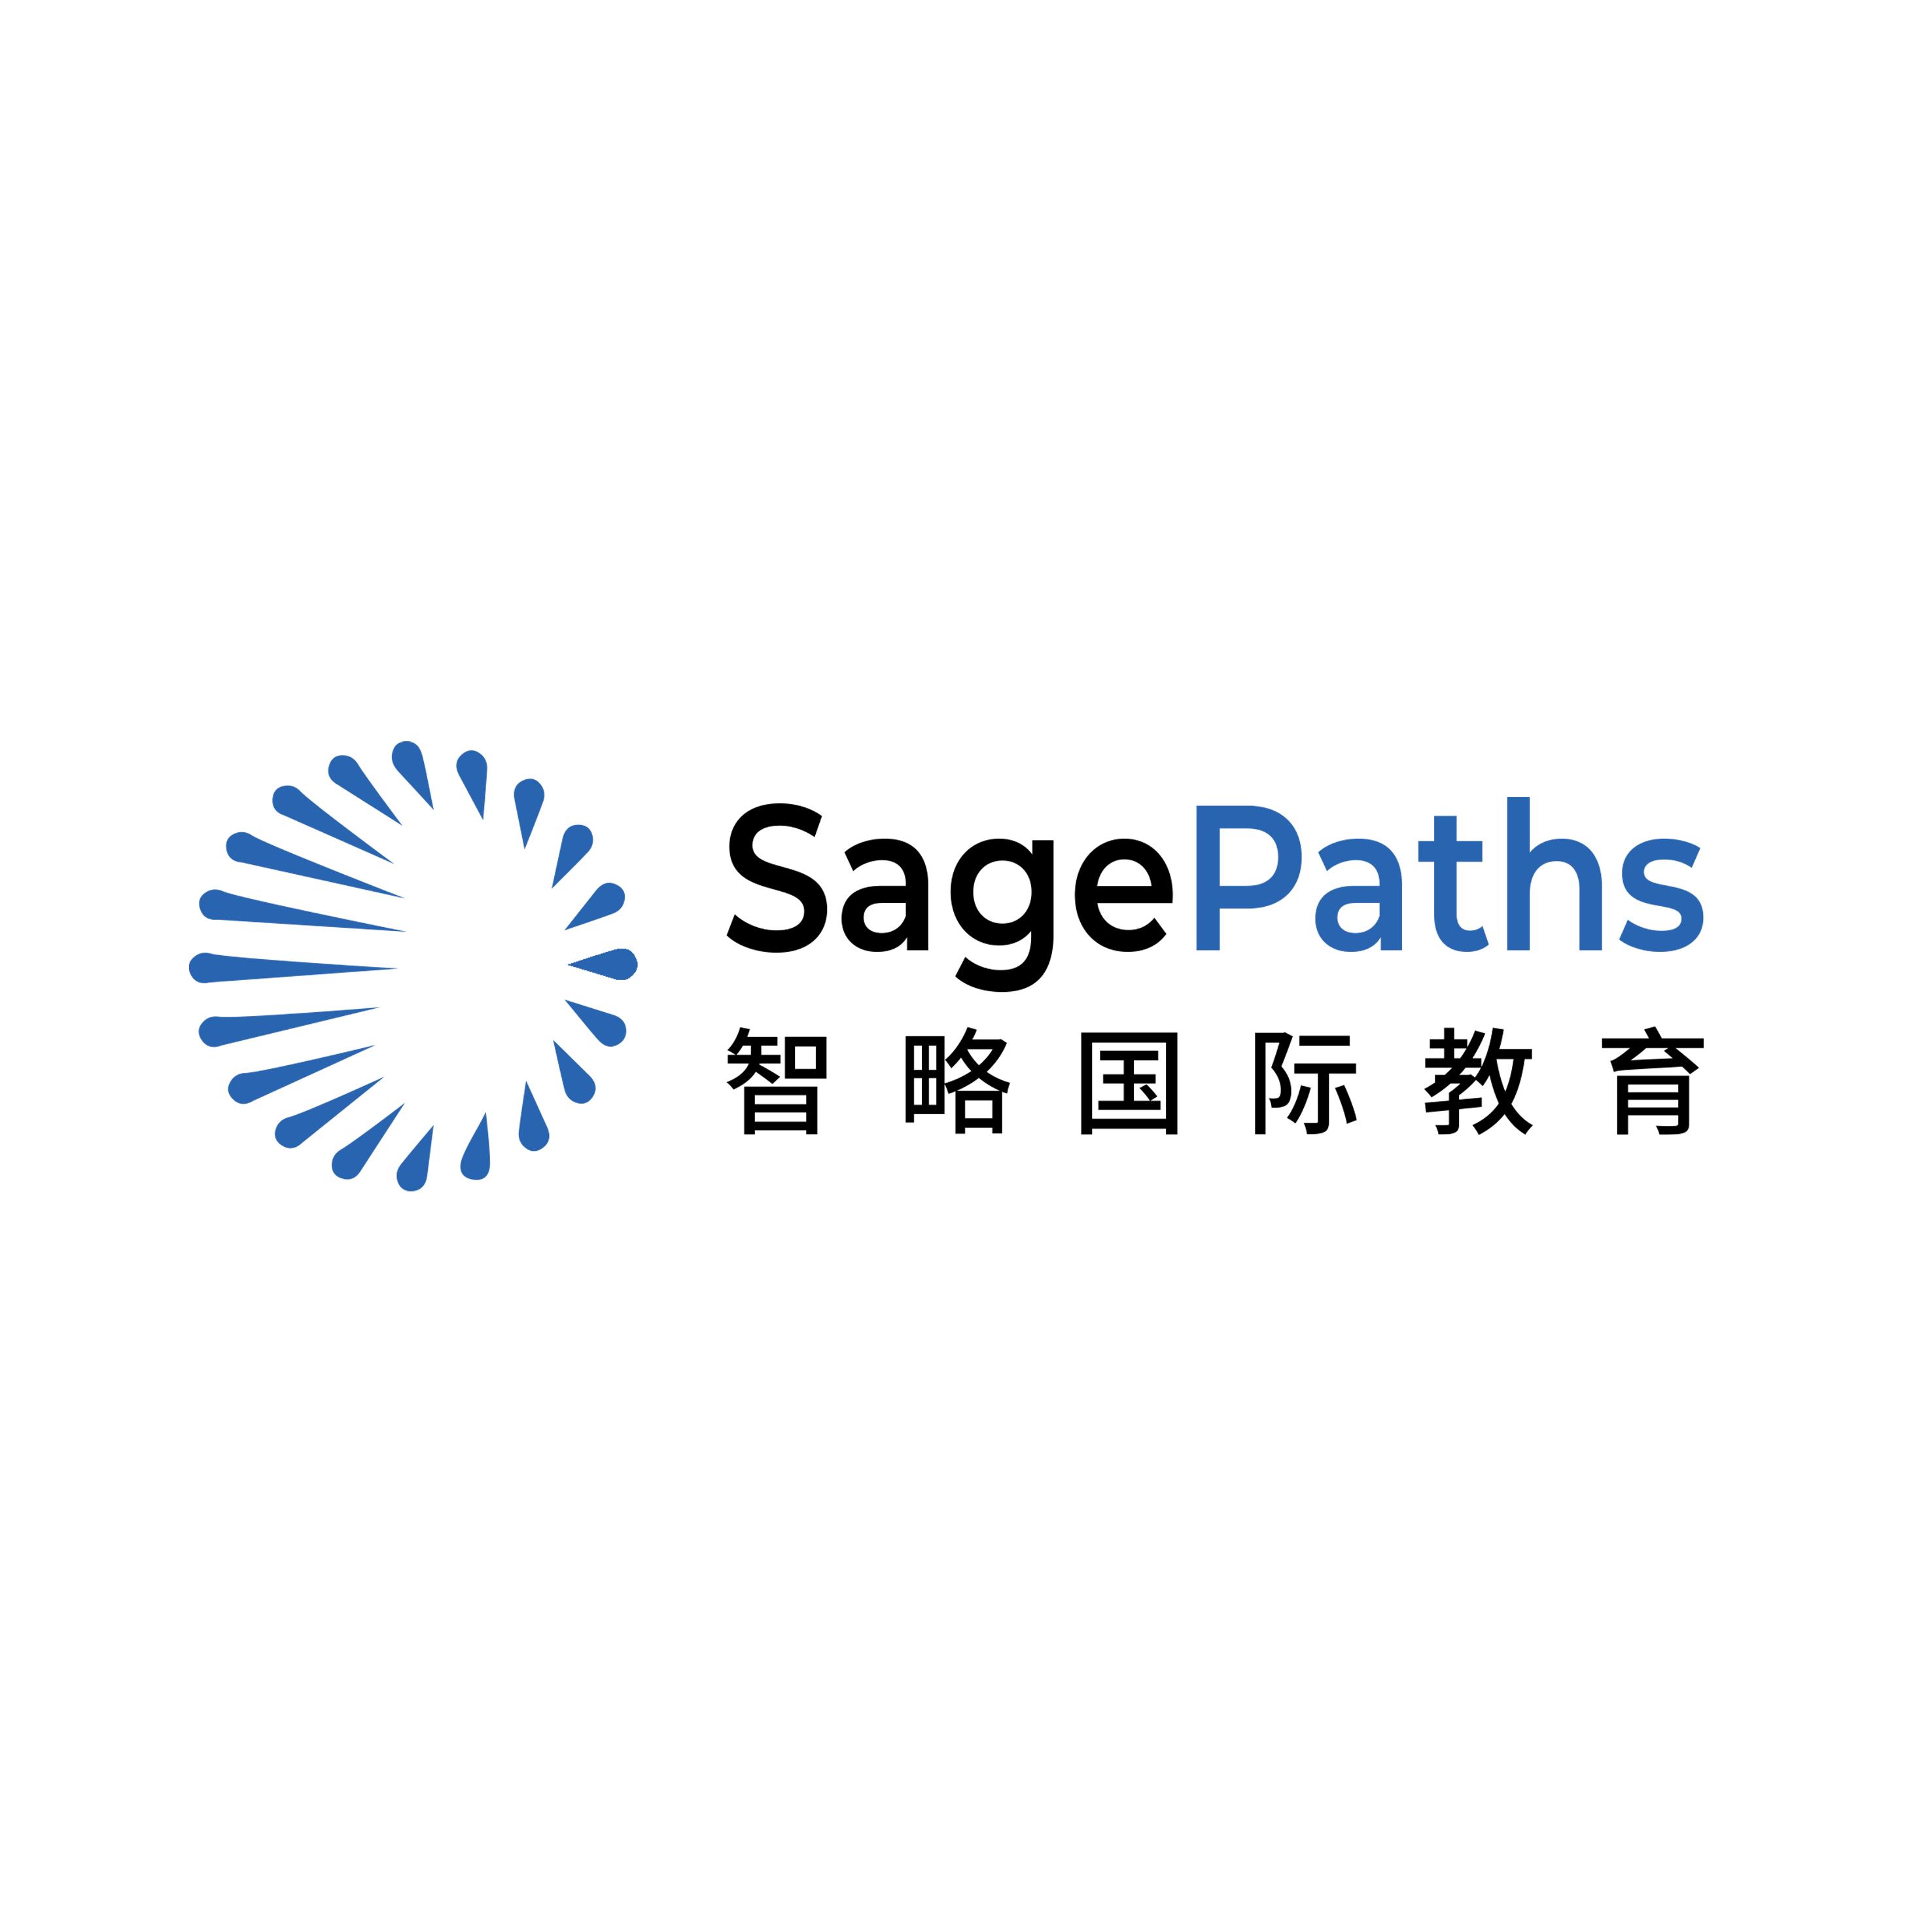 https://sg.mncjobz.com/company/sagepaths-global-education-1620254611